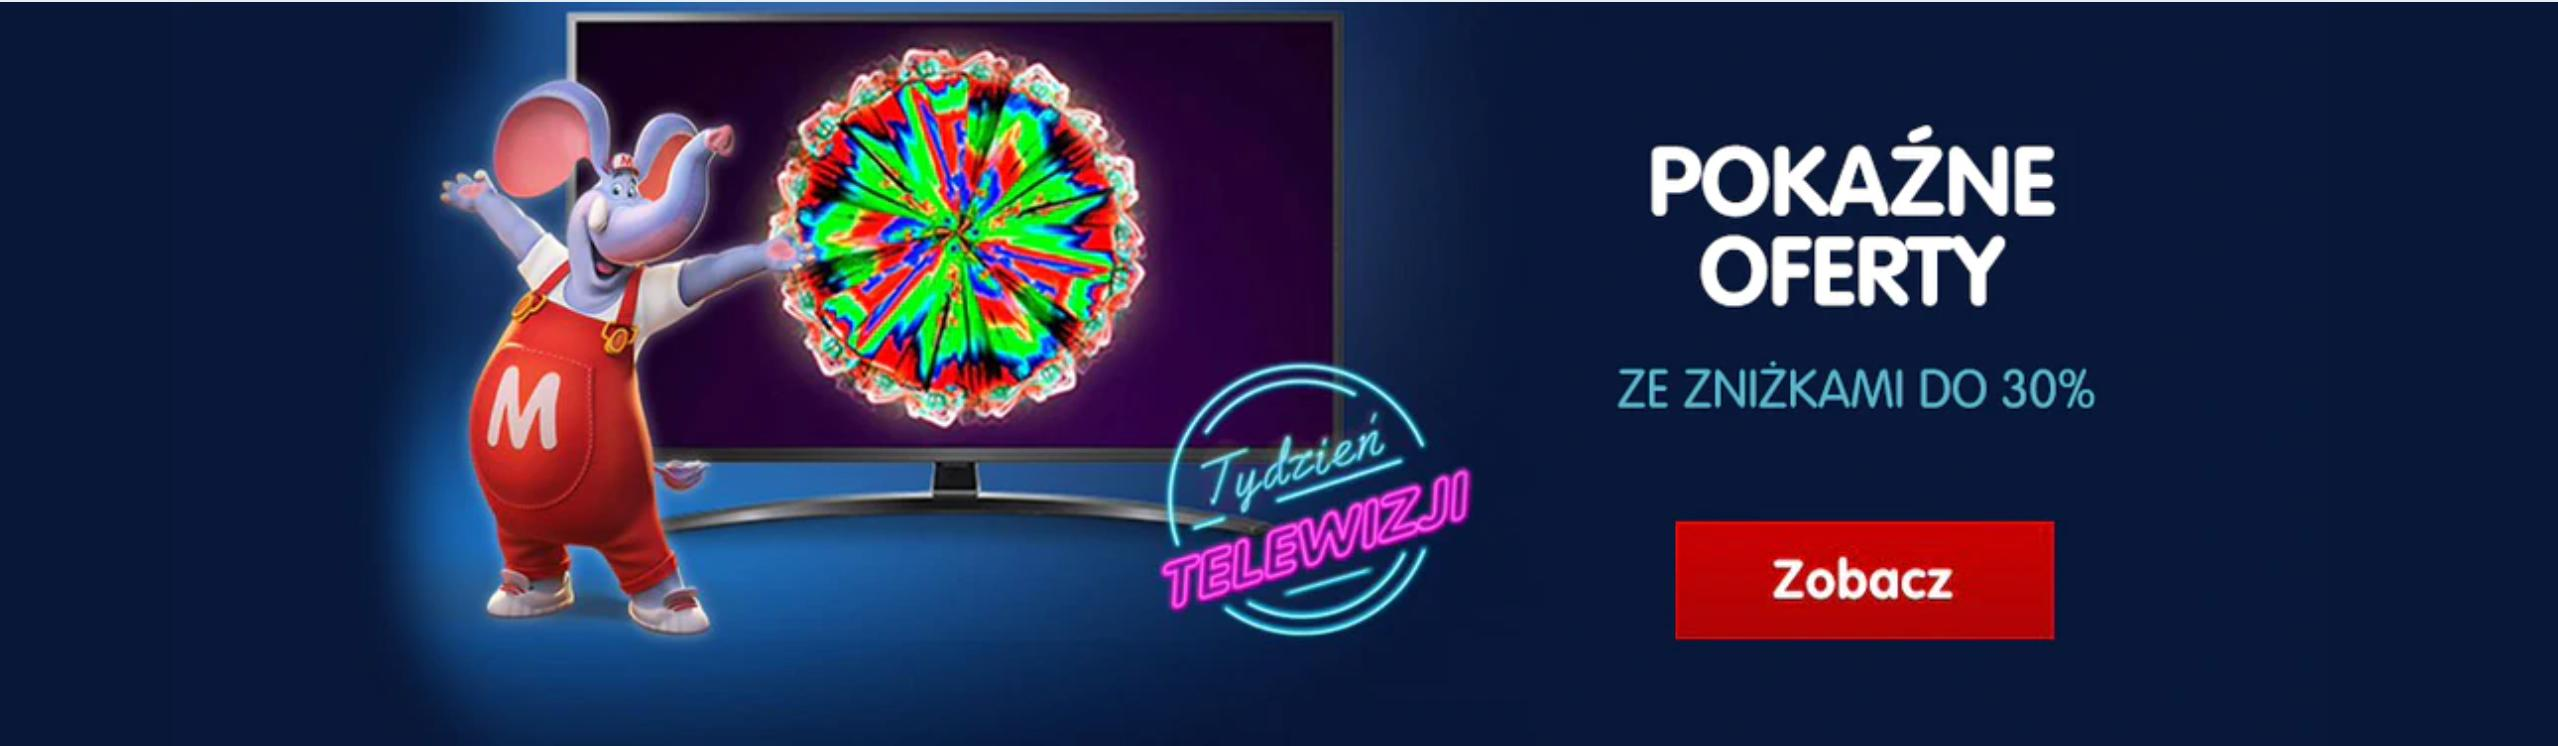 Mall: Tydzień Telewizji do 30% rabatu na telewizory